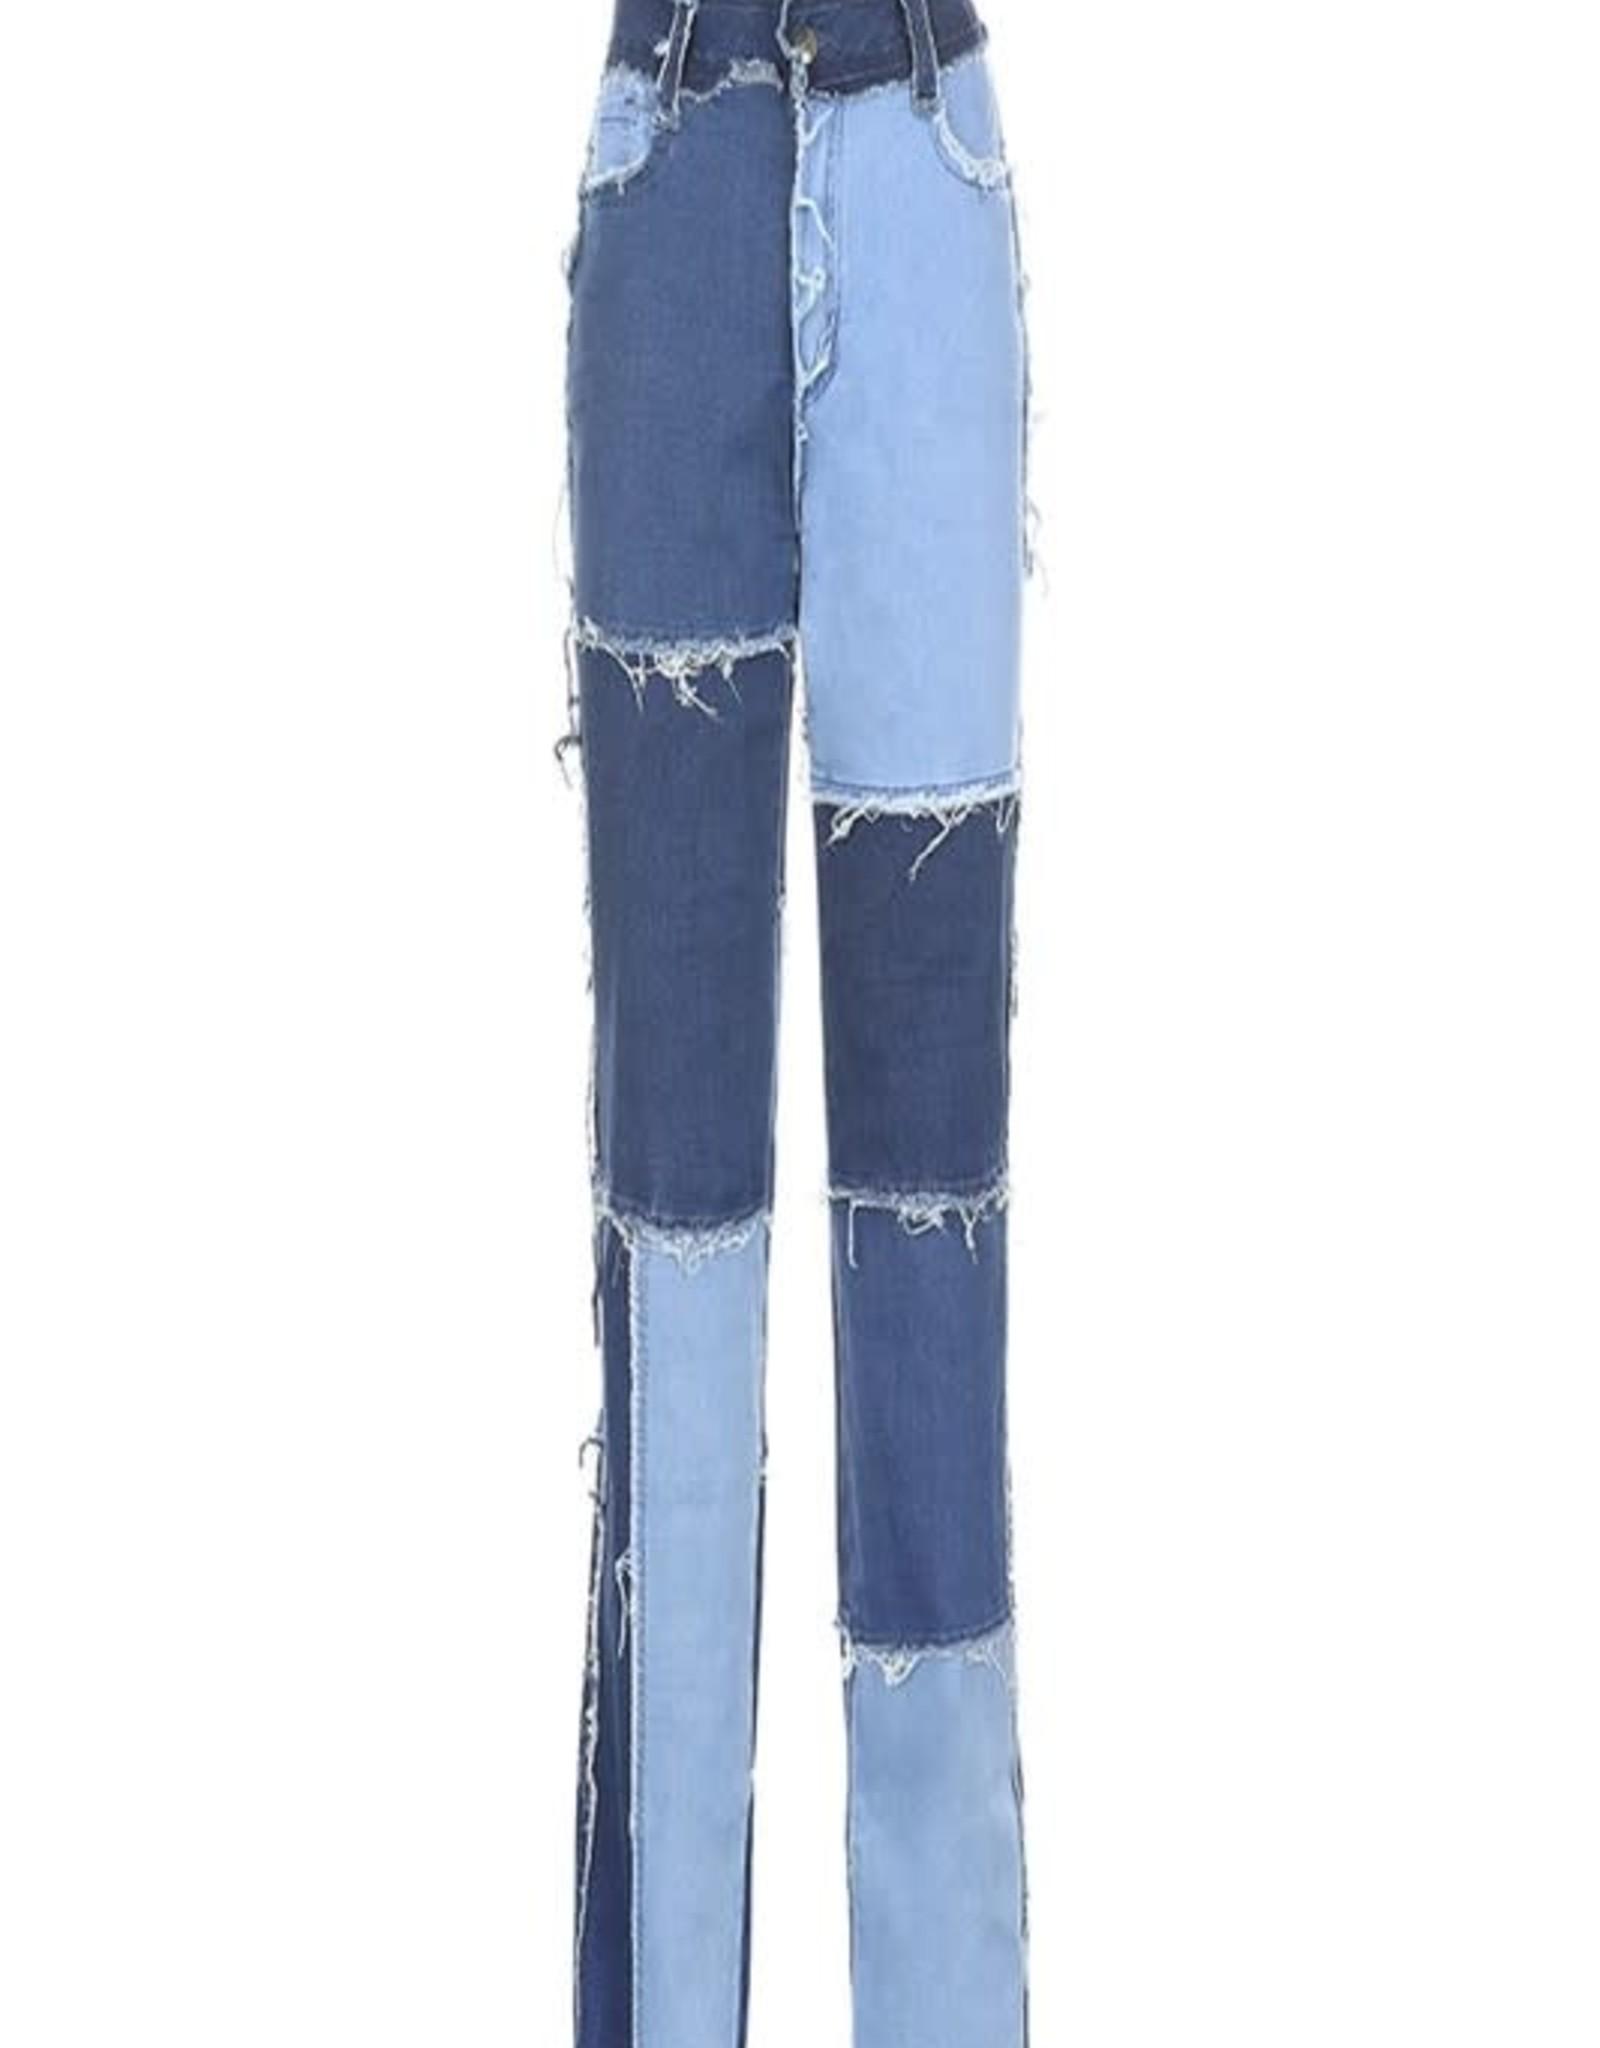 Hippie Stitch  Jeans